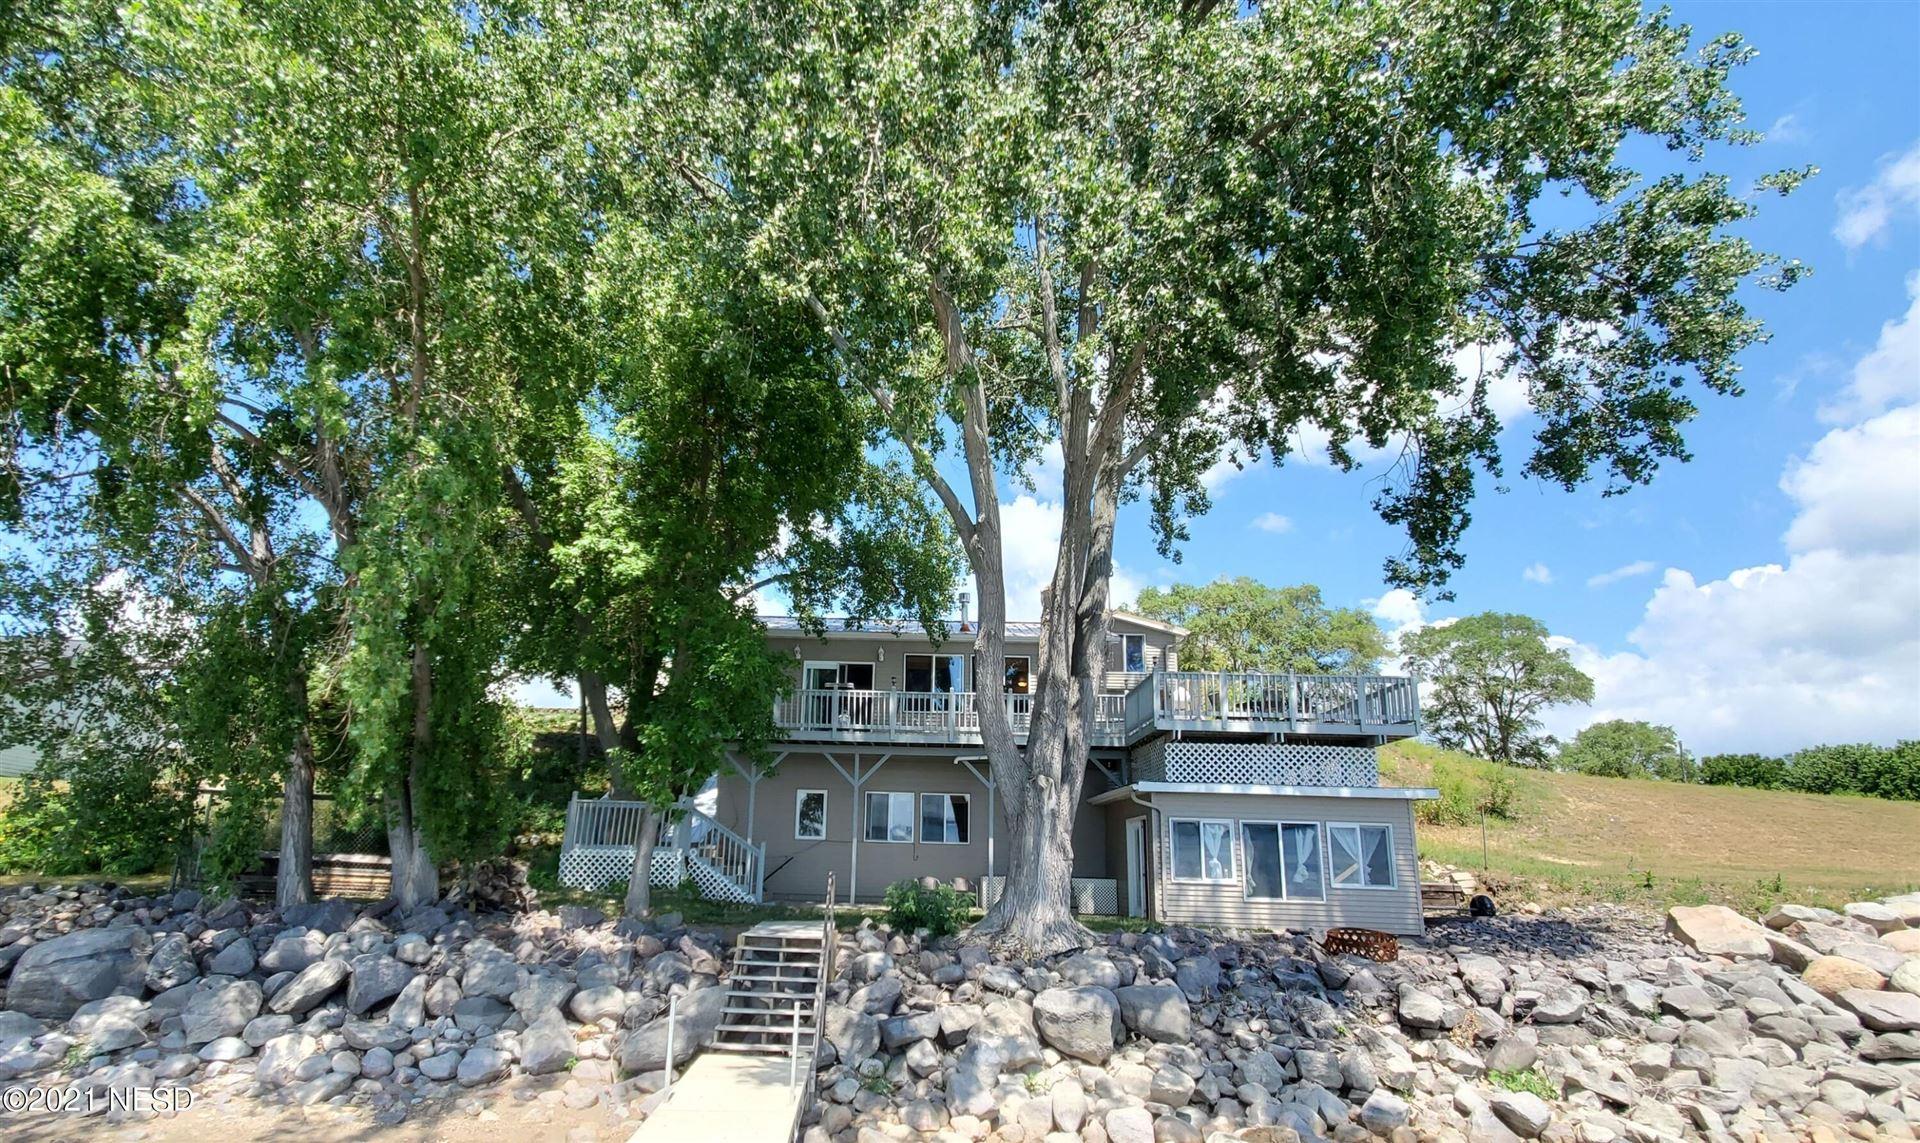 Photo of 112 NW LAKE DRIVE, Lake Norden, SD 57248 (MLS # 30-4183)